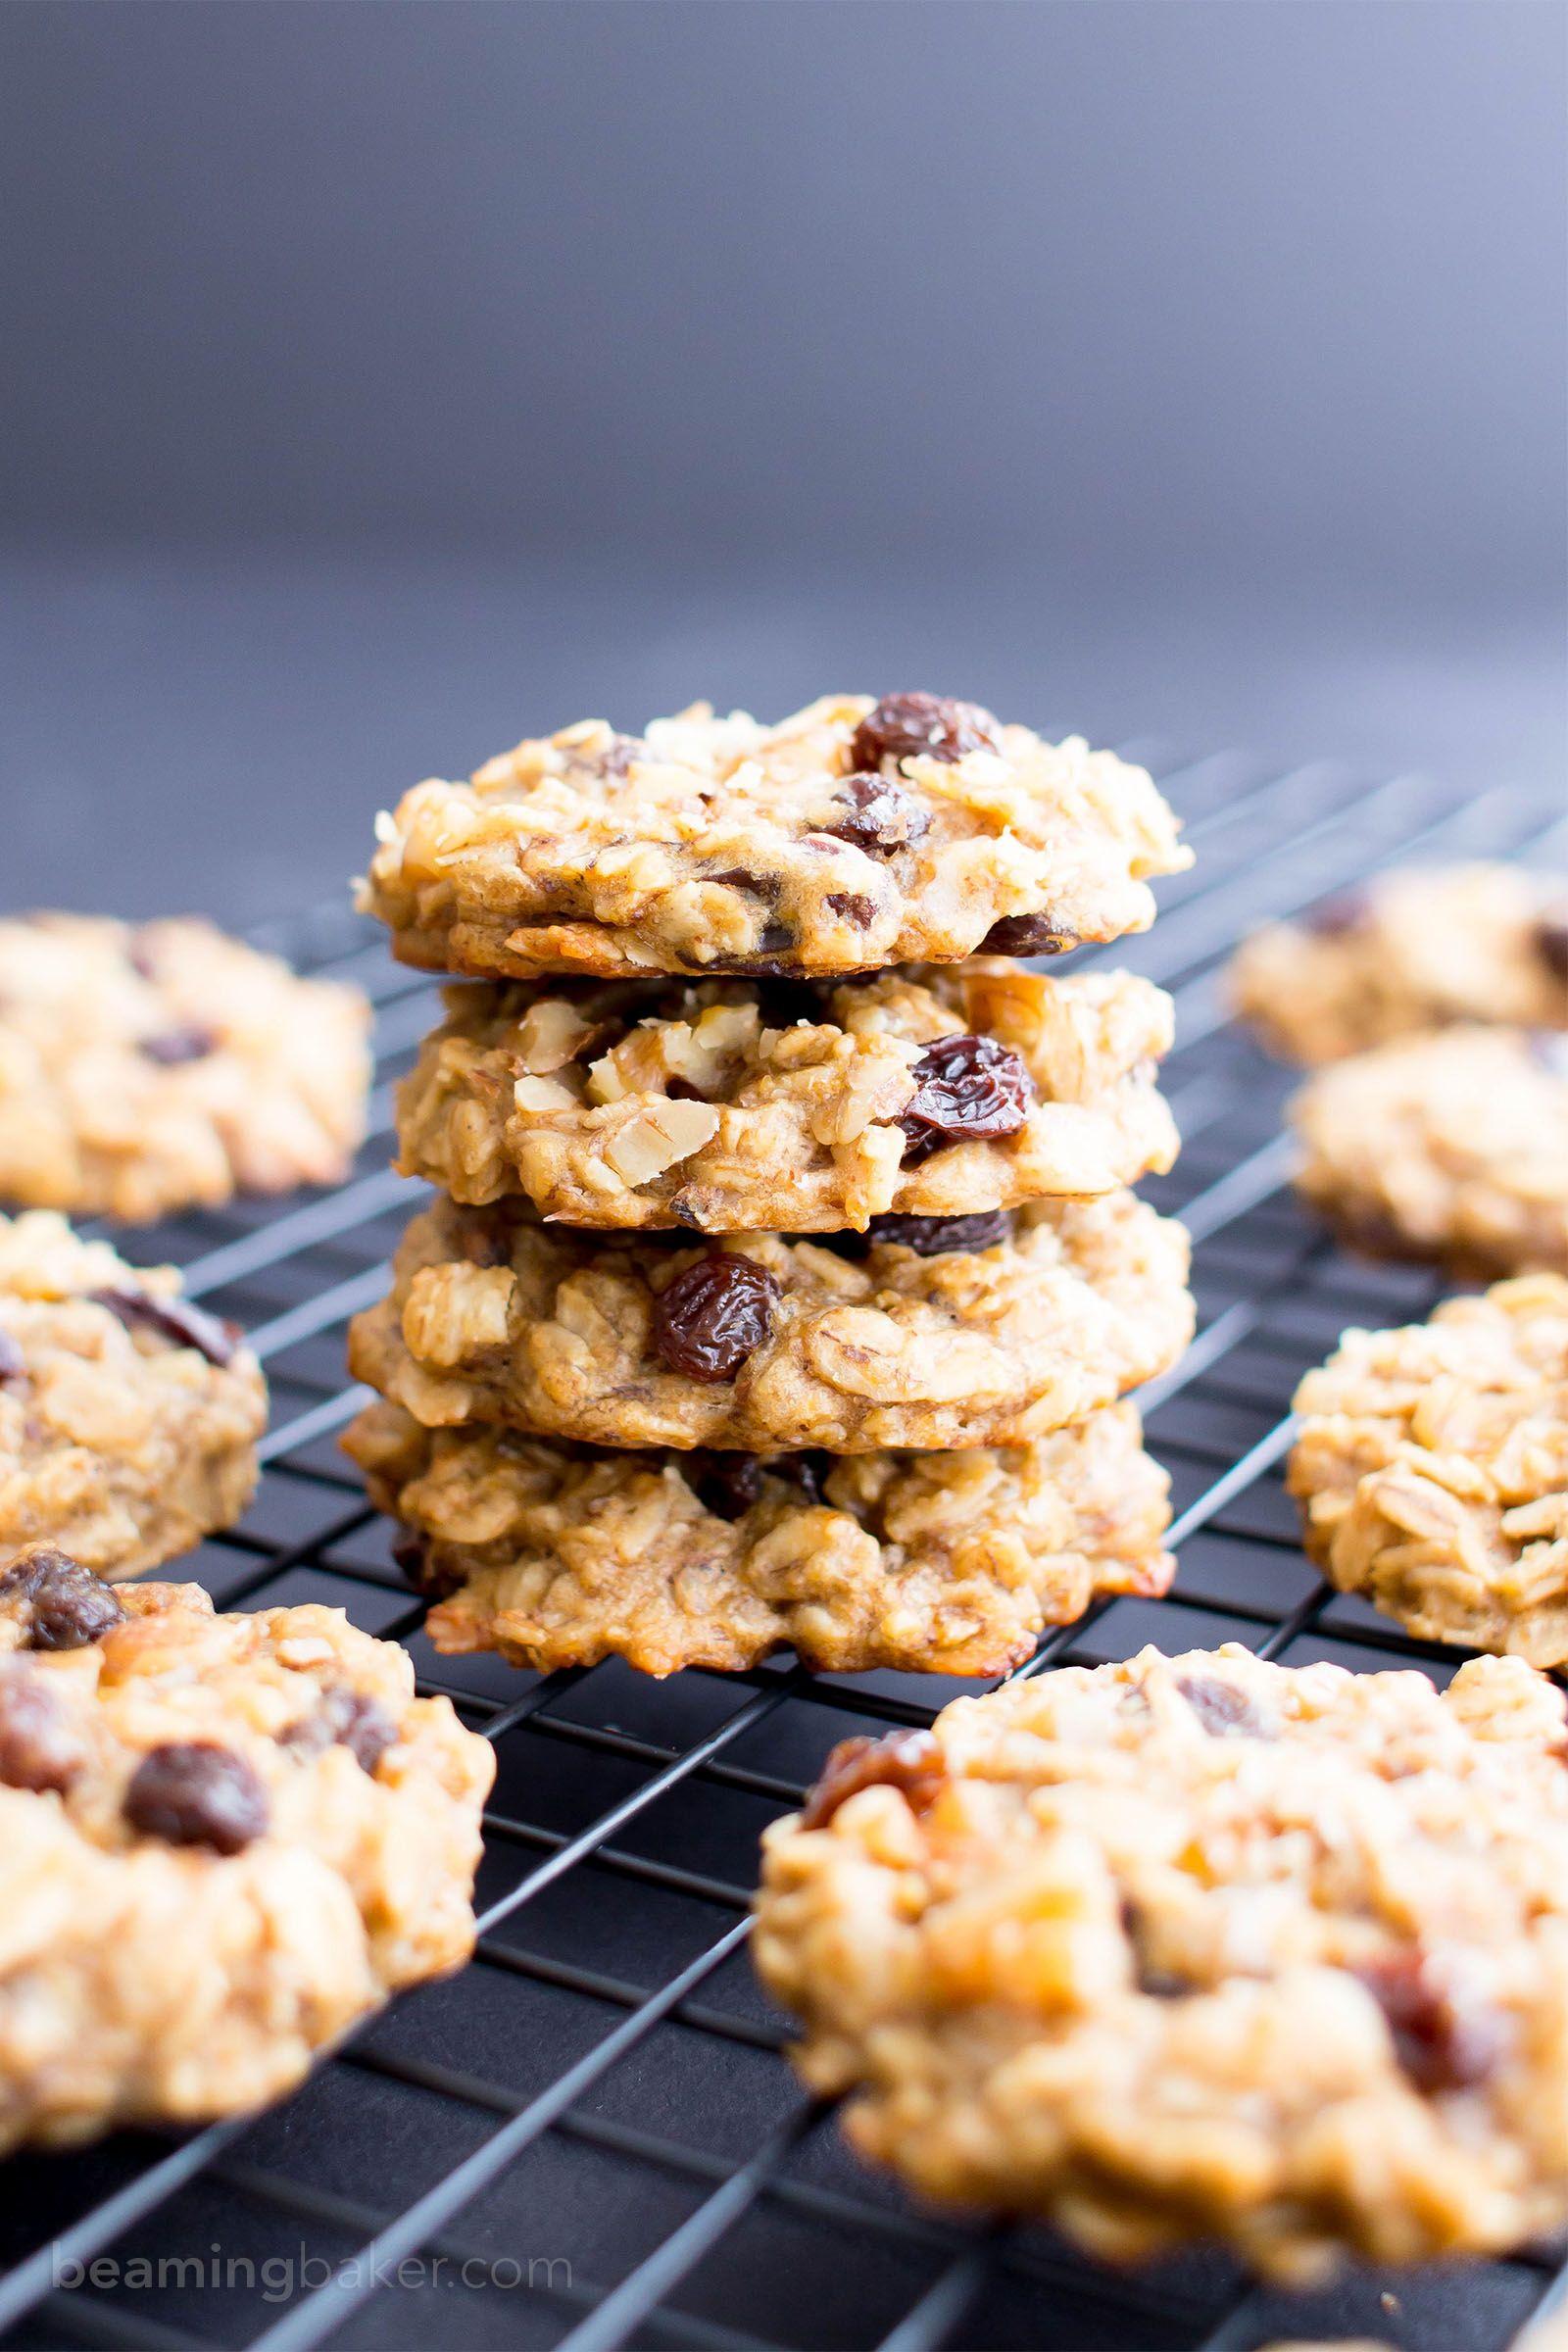 Easy Vegan Peanut Butter Banana Breakfast Cookies Gluten Free V